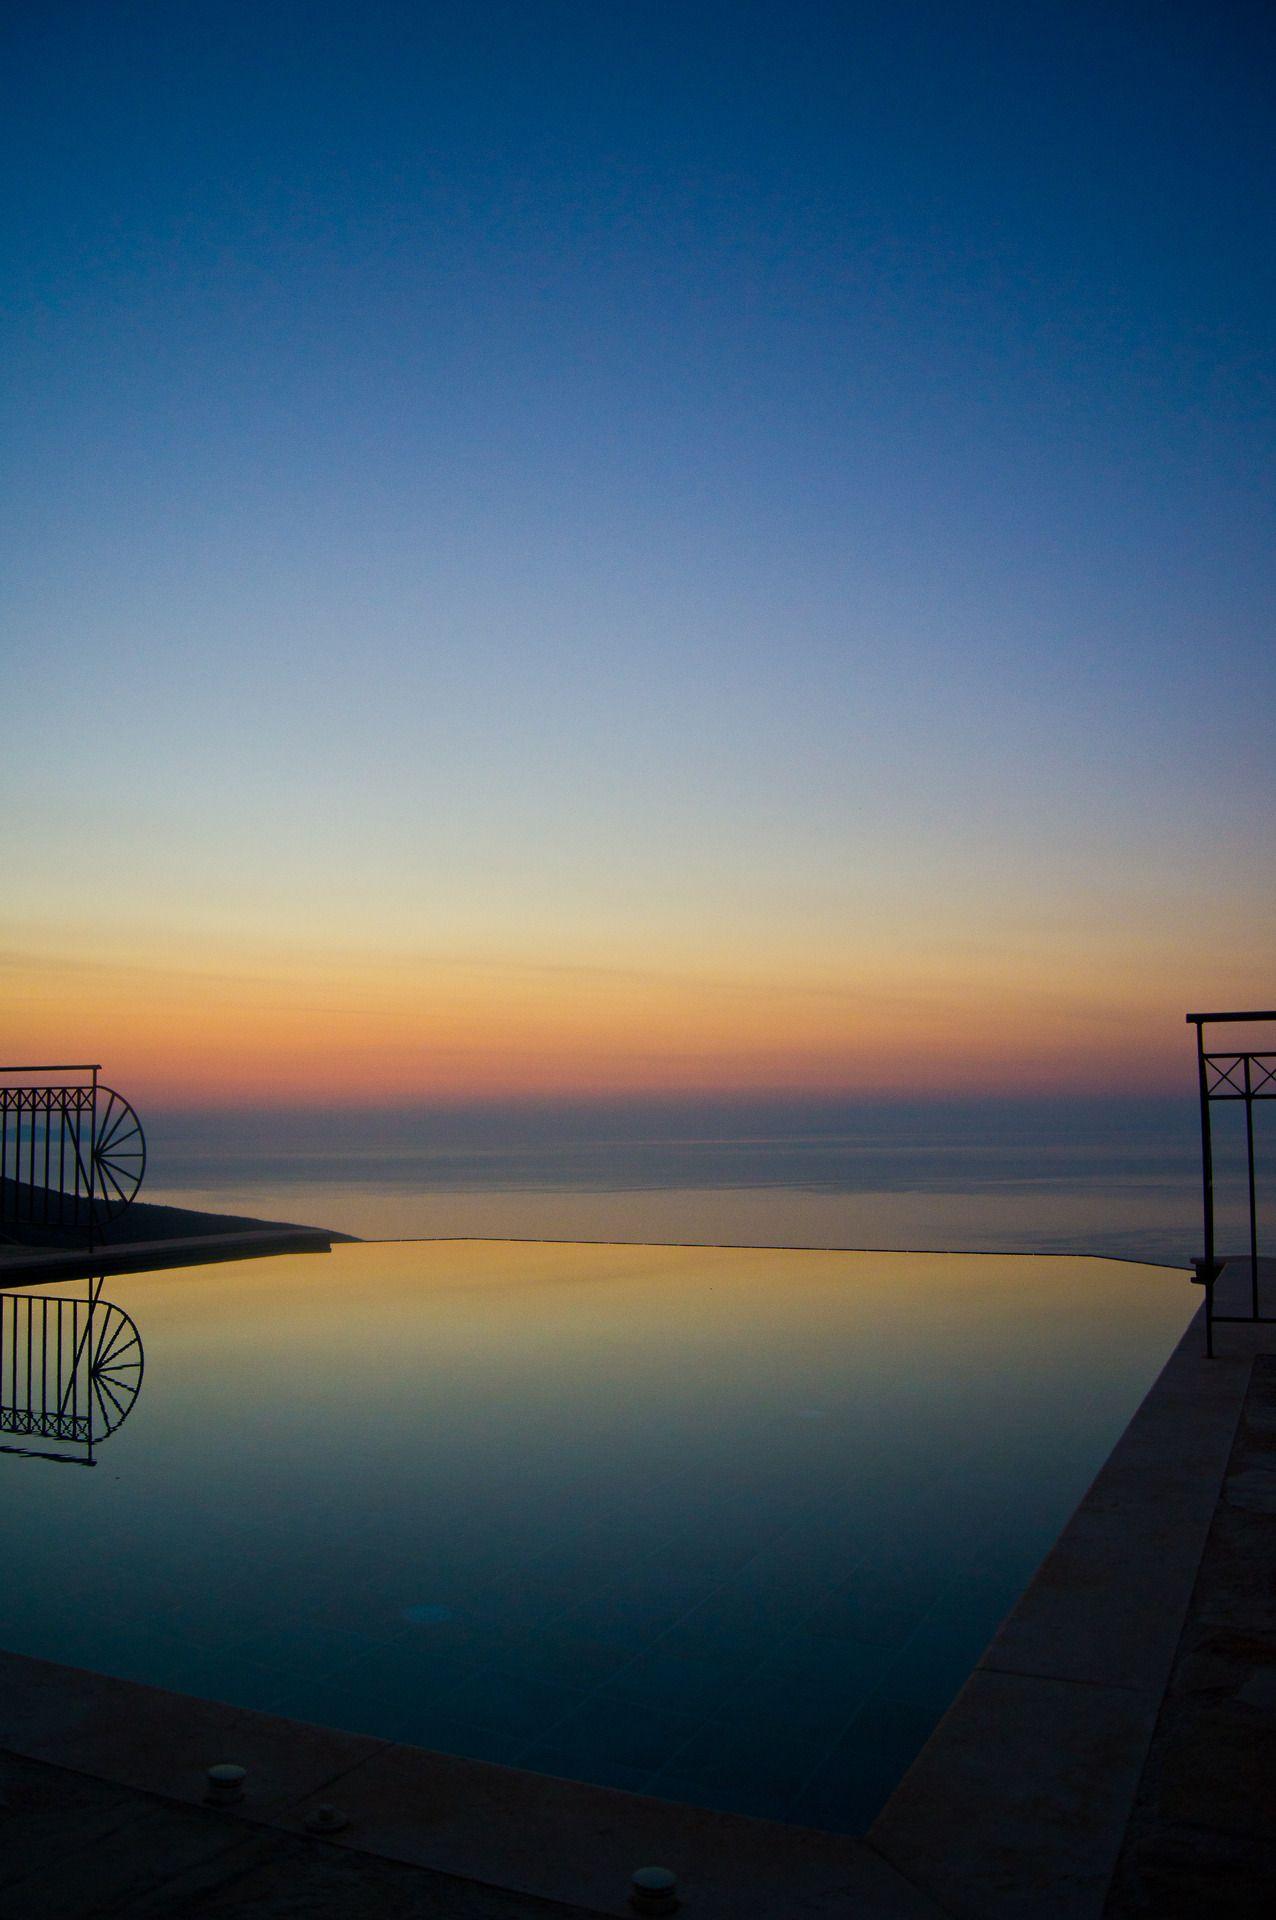 Cephalonia - Greece (by Evo Flash)